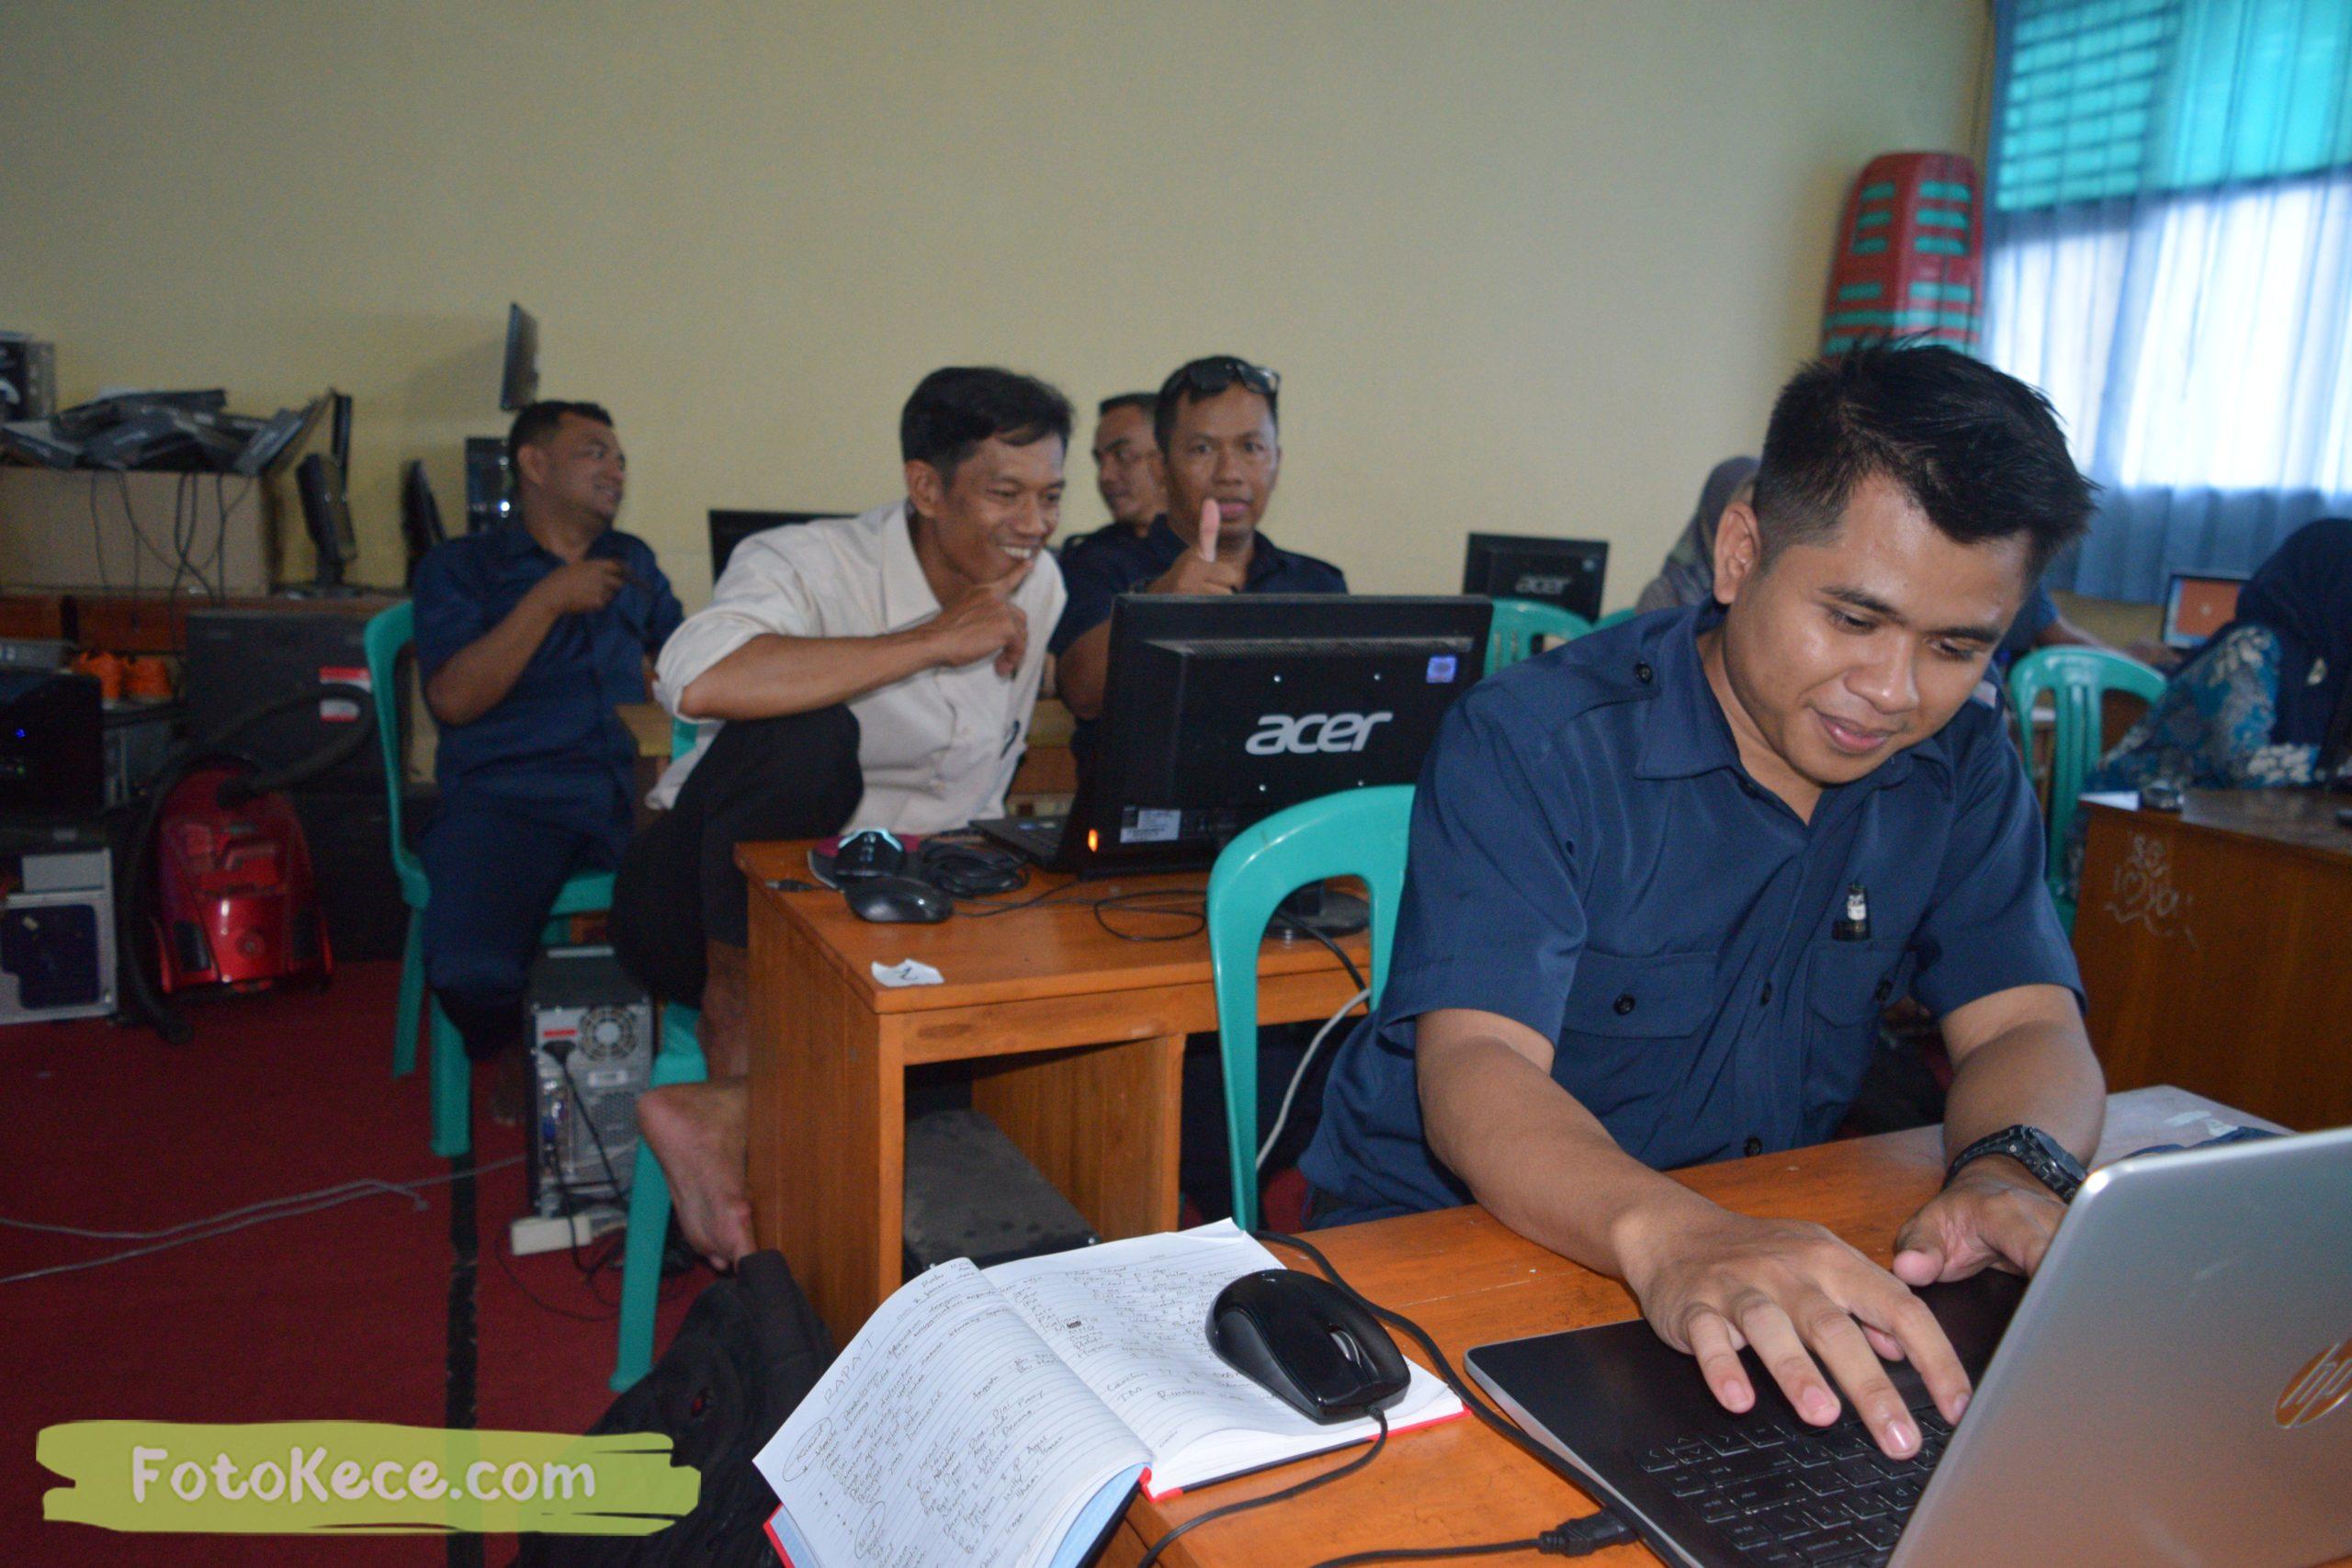 bimbingan teknis sieka 2020 bersama Bpk Abdul Aziz 08012020 fotokece 8 scaled